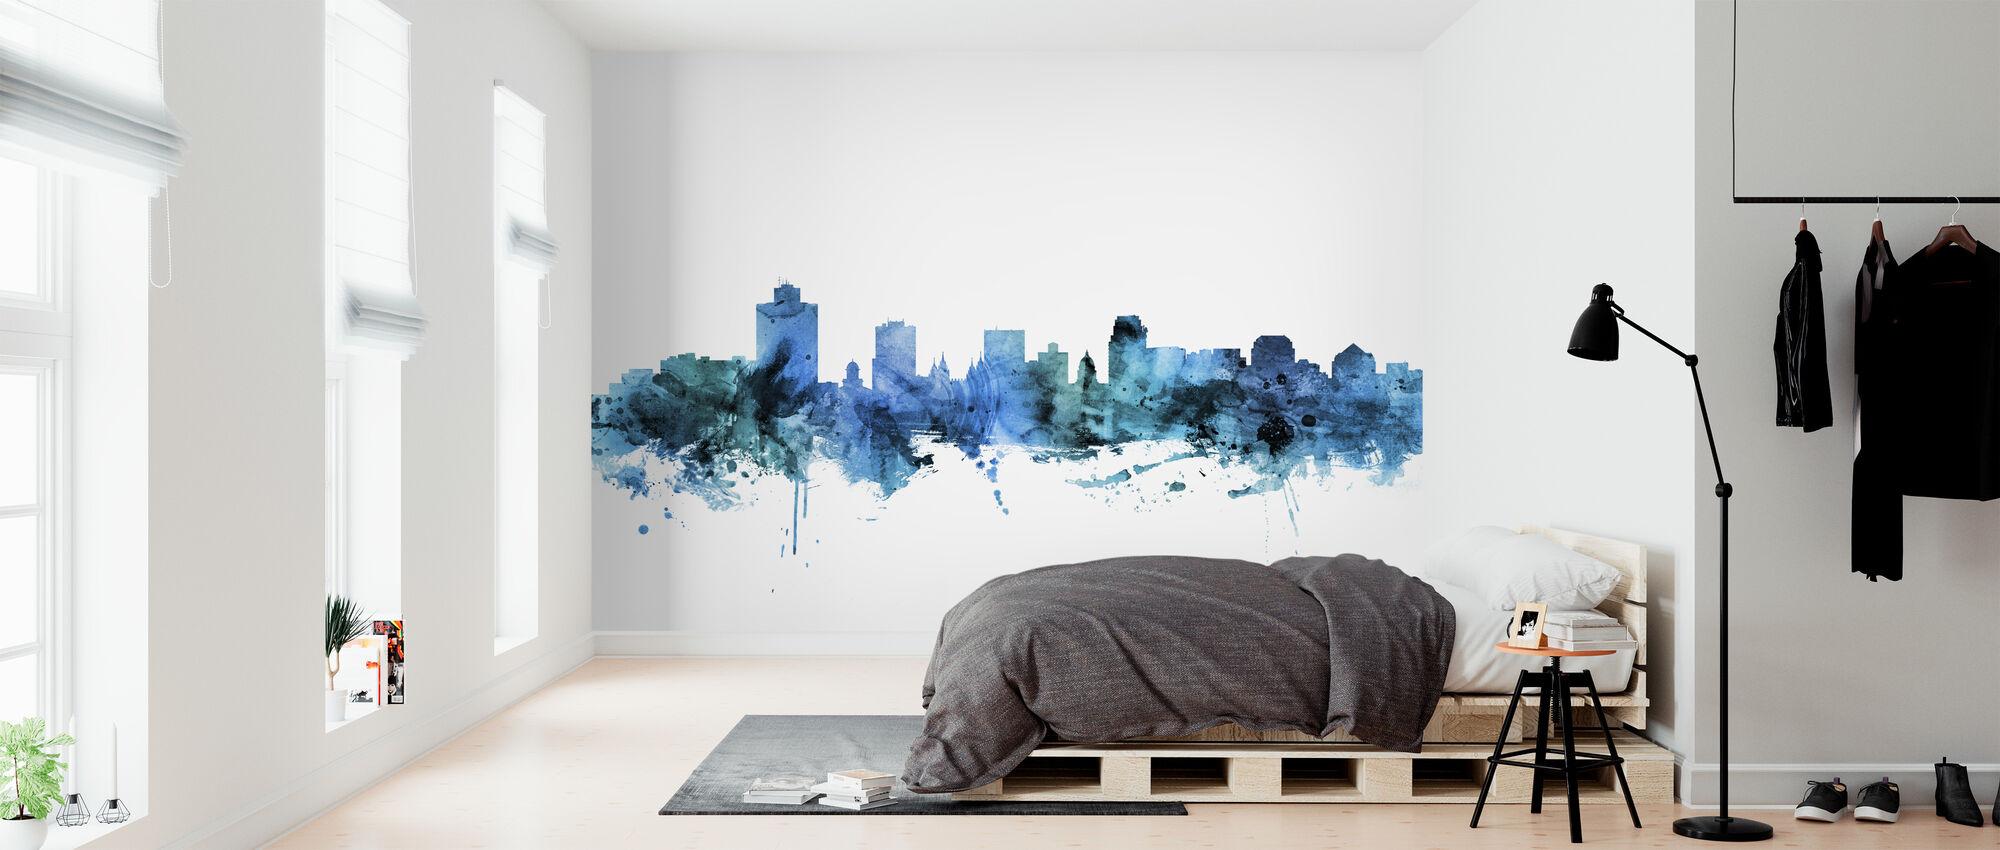 Salt Lake City Utah Skyline - Wallpaper - Bedroom